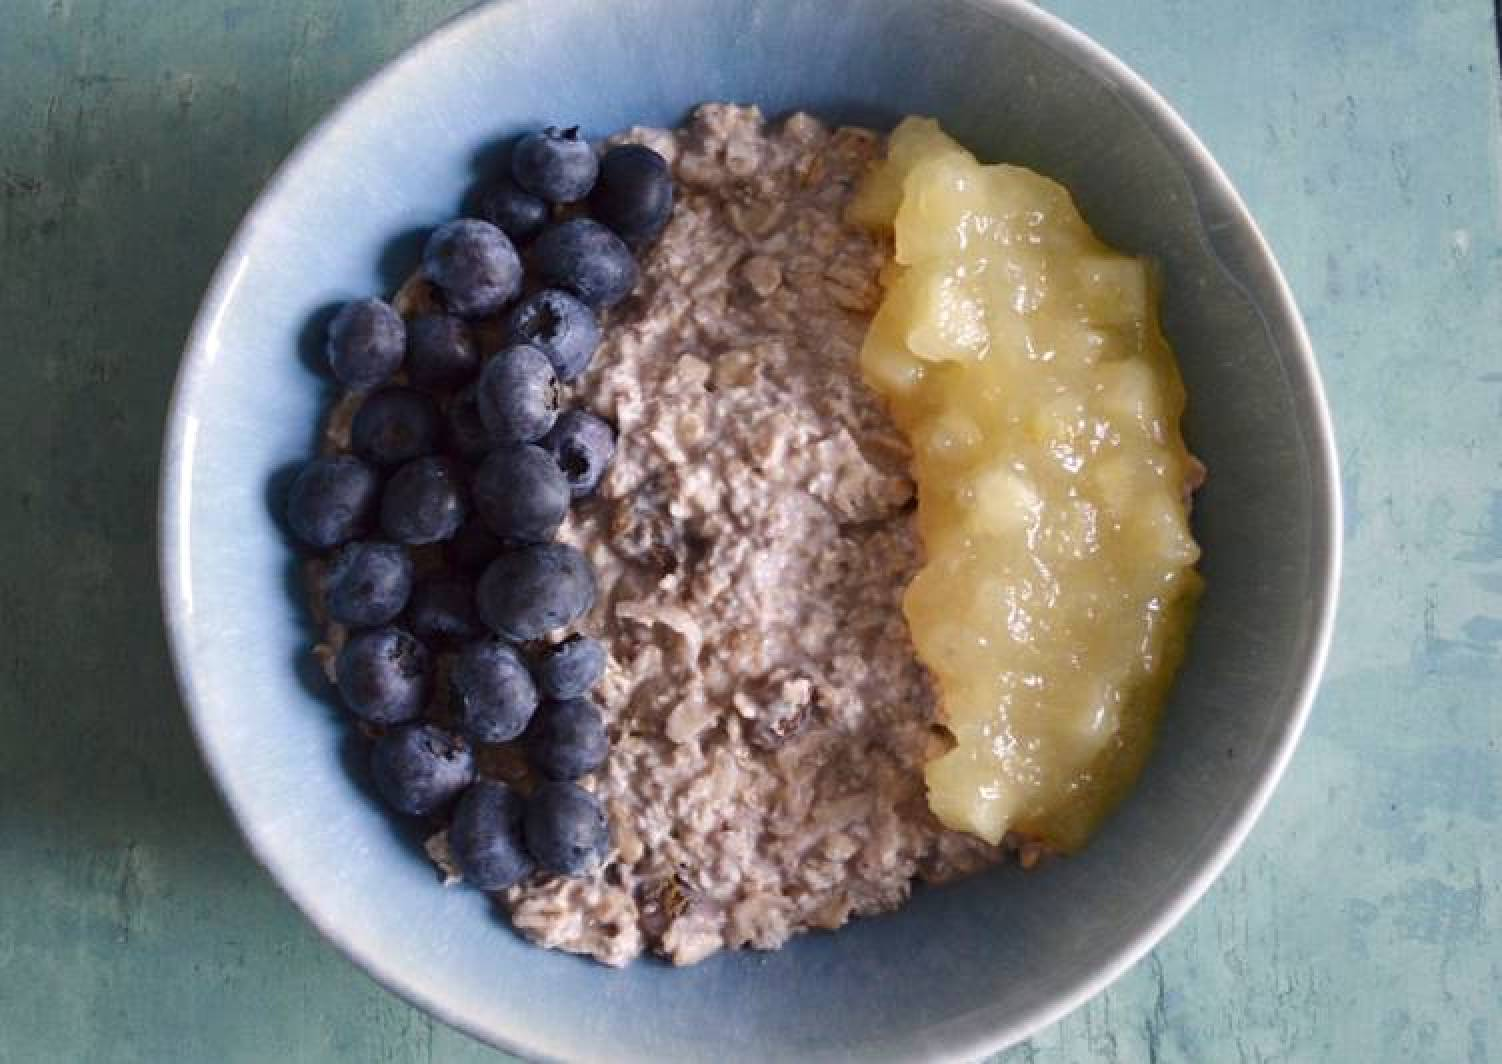 Apple and Blueberry Bircher